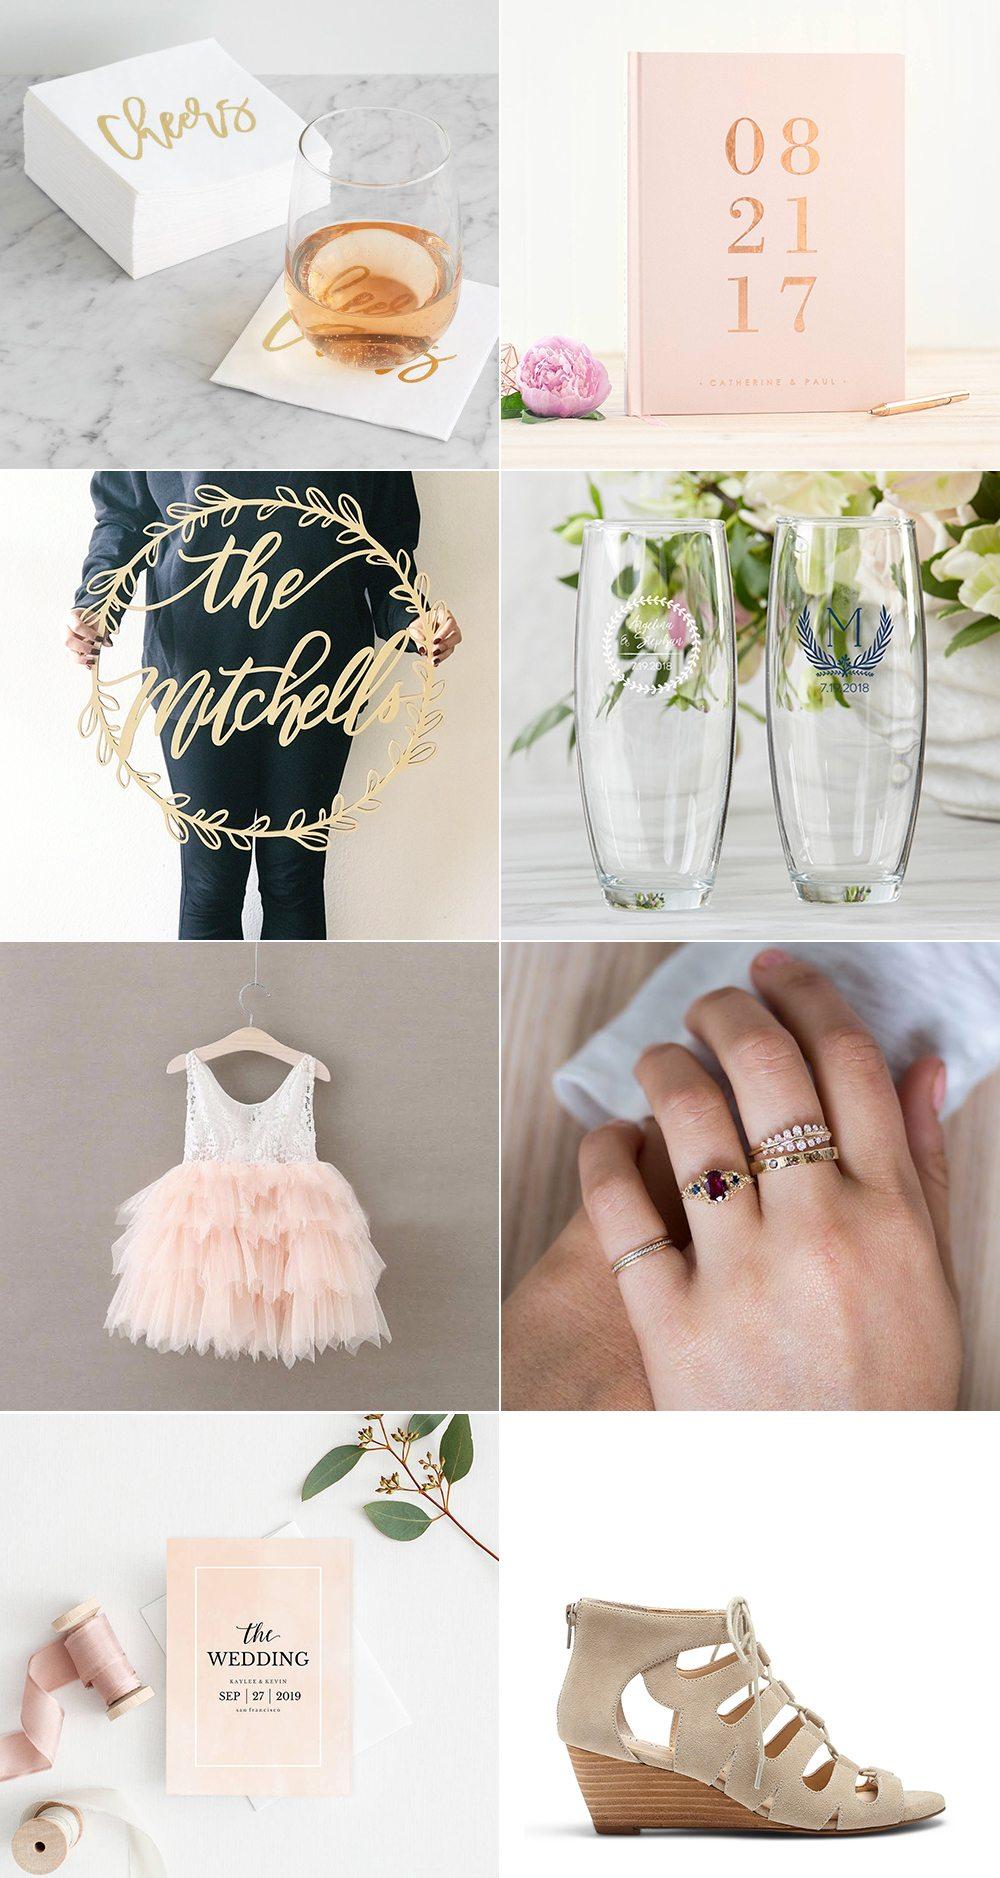 Backyard Wedding Ideas   Wedding inspiration, wedding guest book, blush pink wedding ideas from @cydconverse